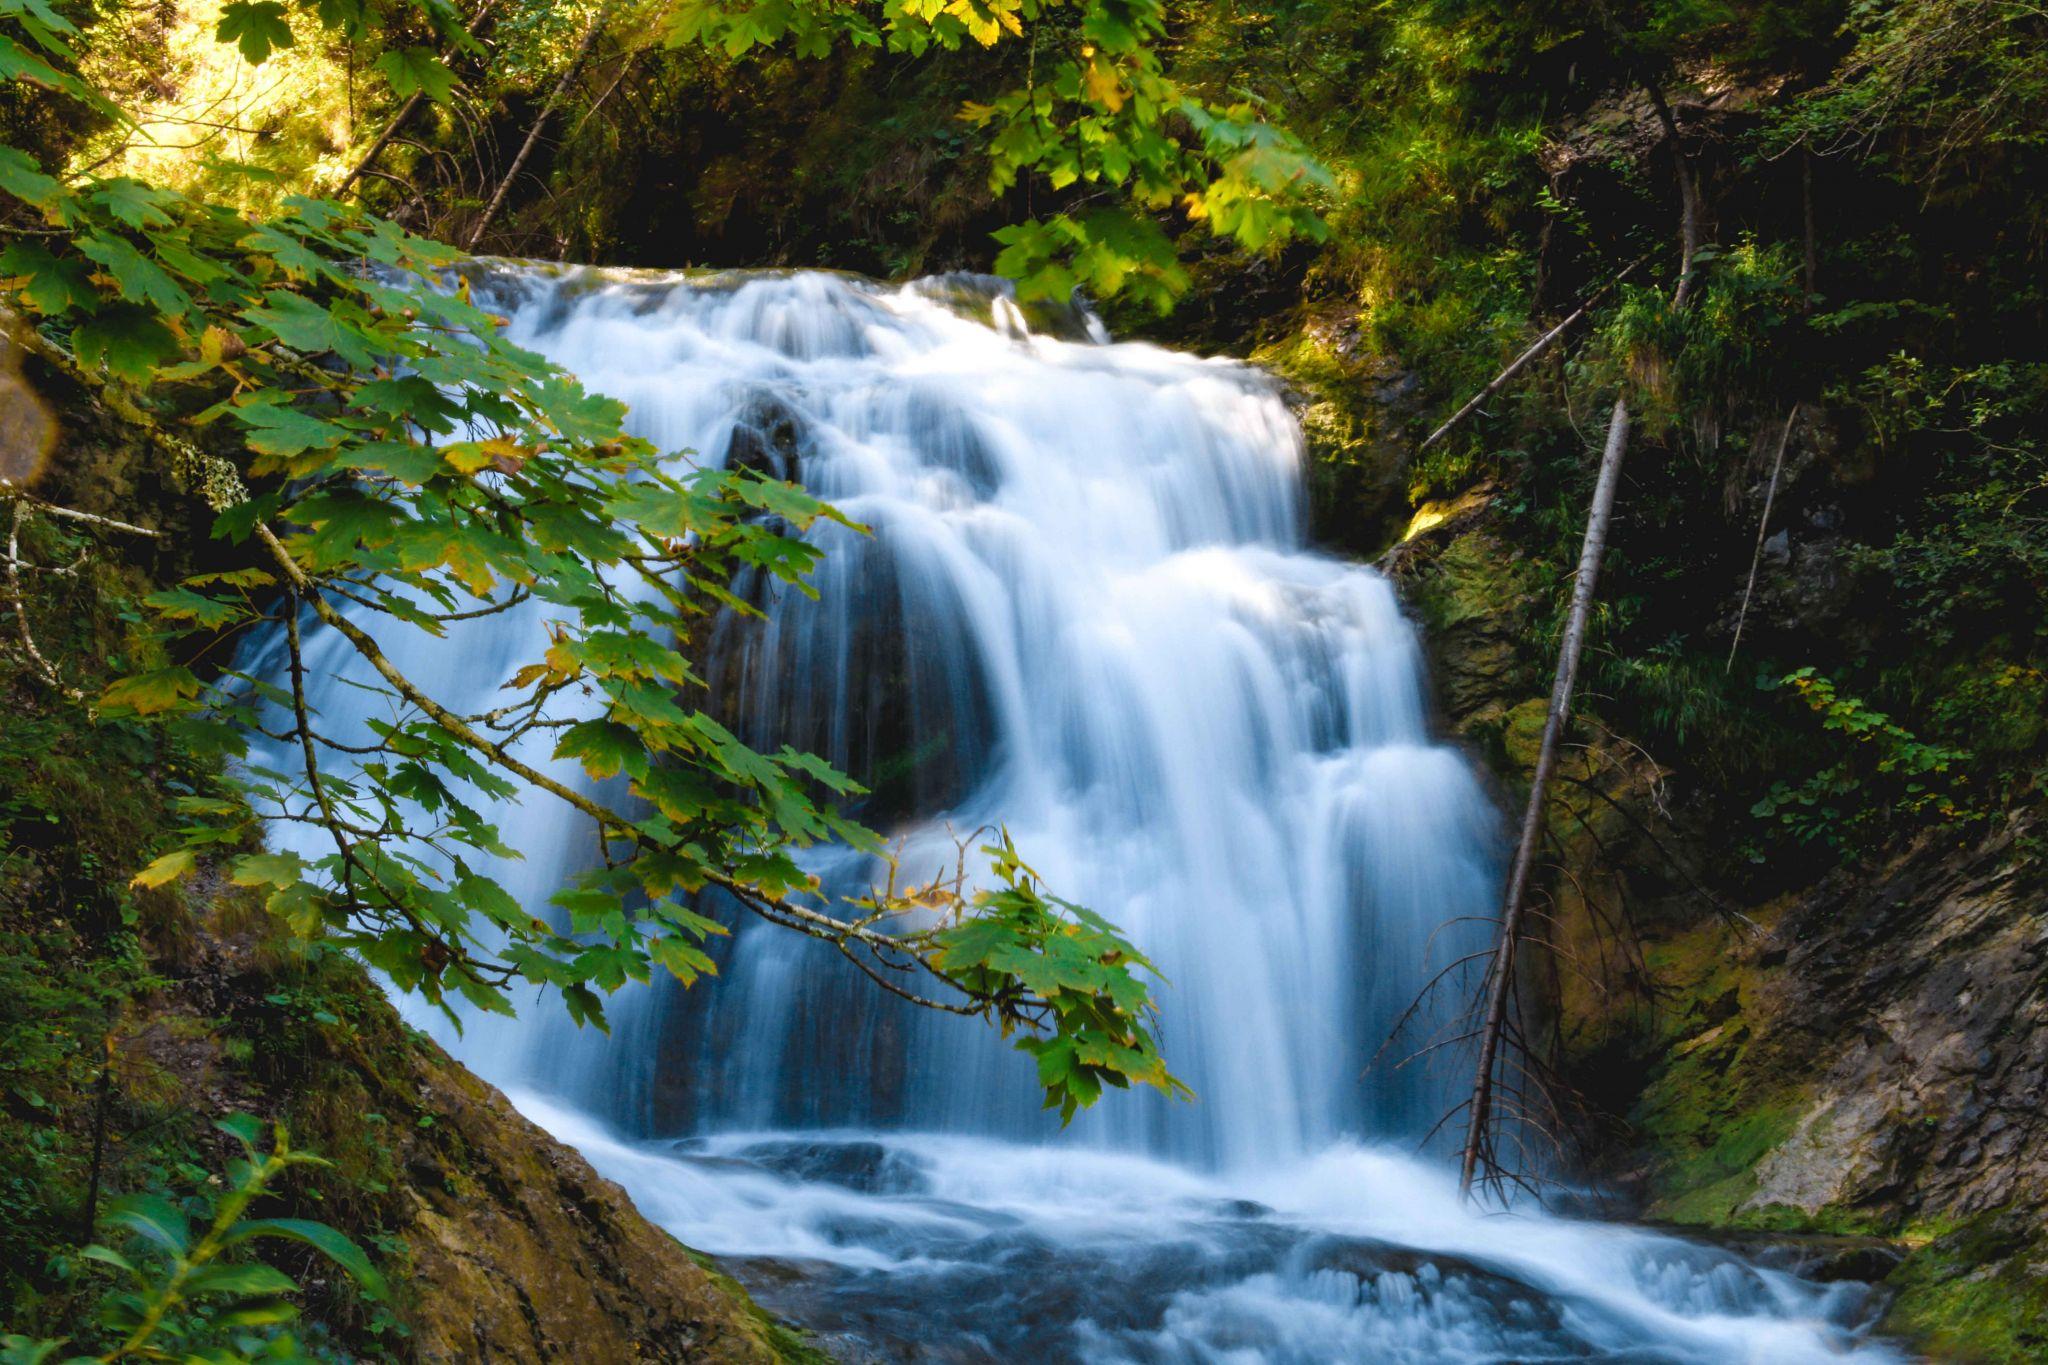 Wasserfall Obernachkanal, Germany